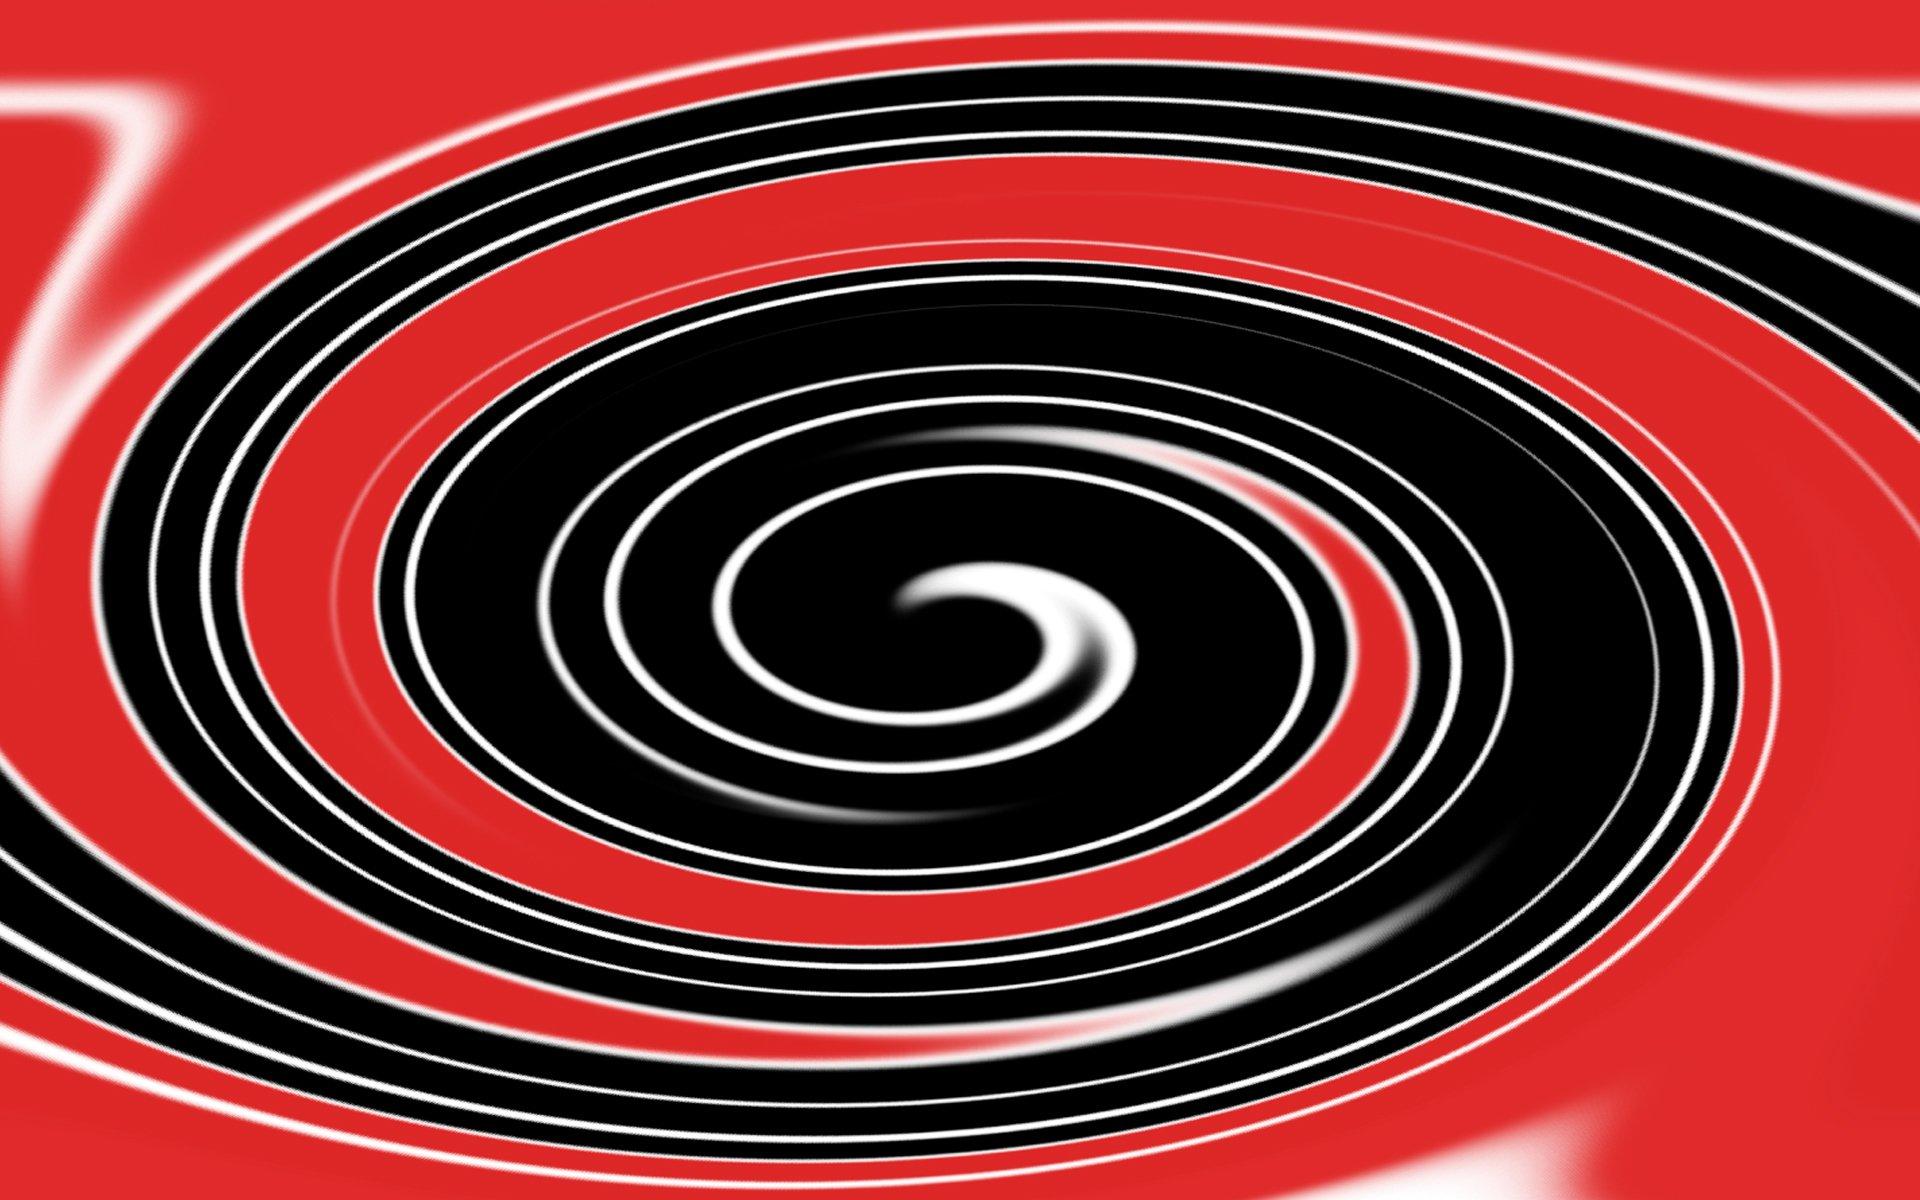 Twister red/black/white wallpaper